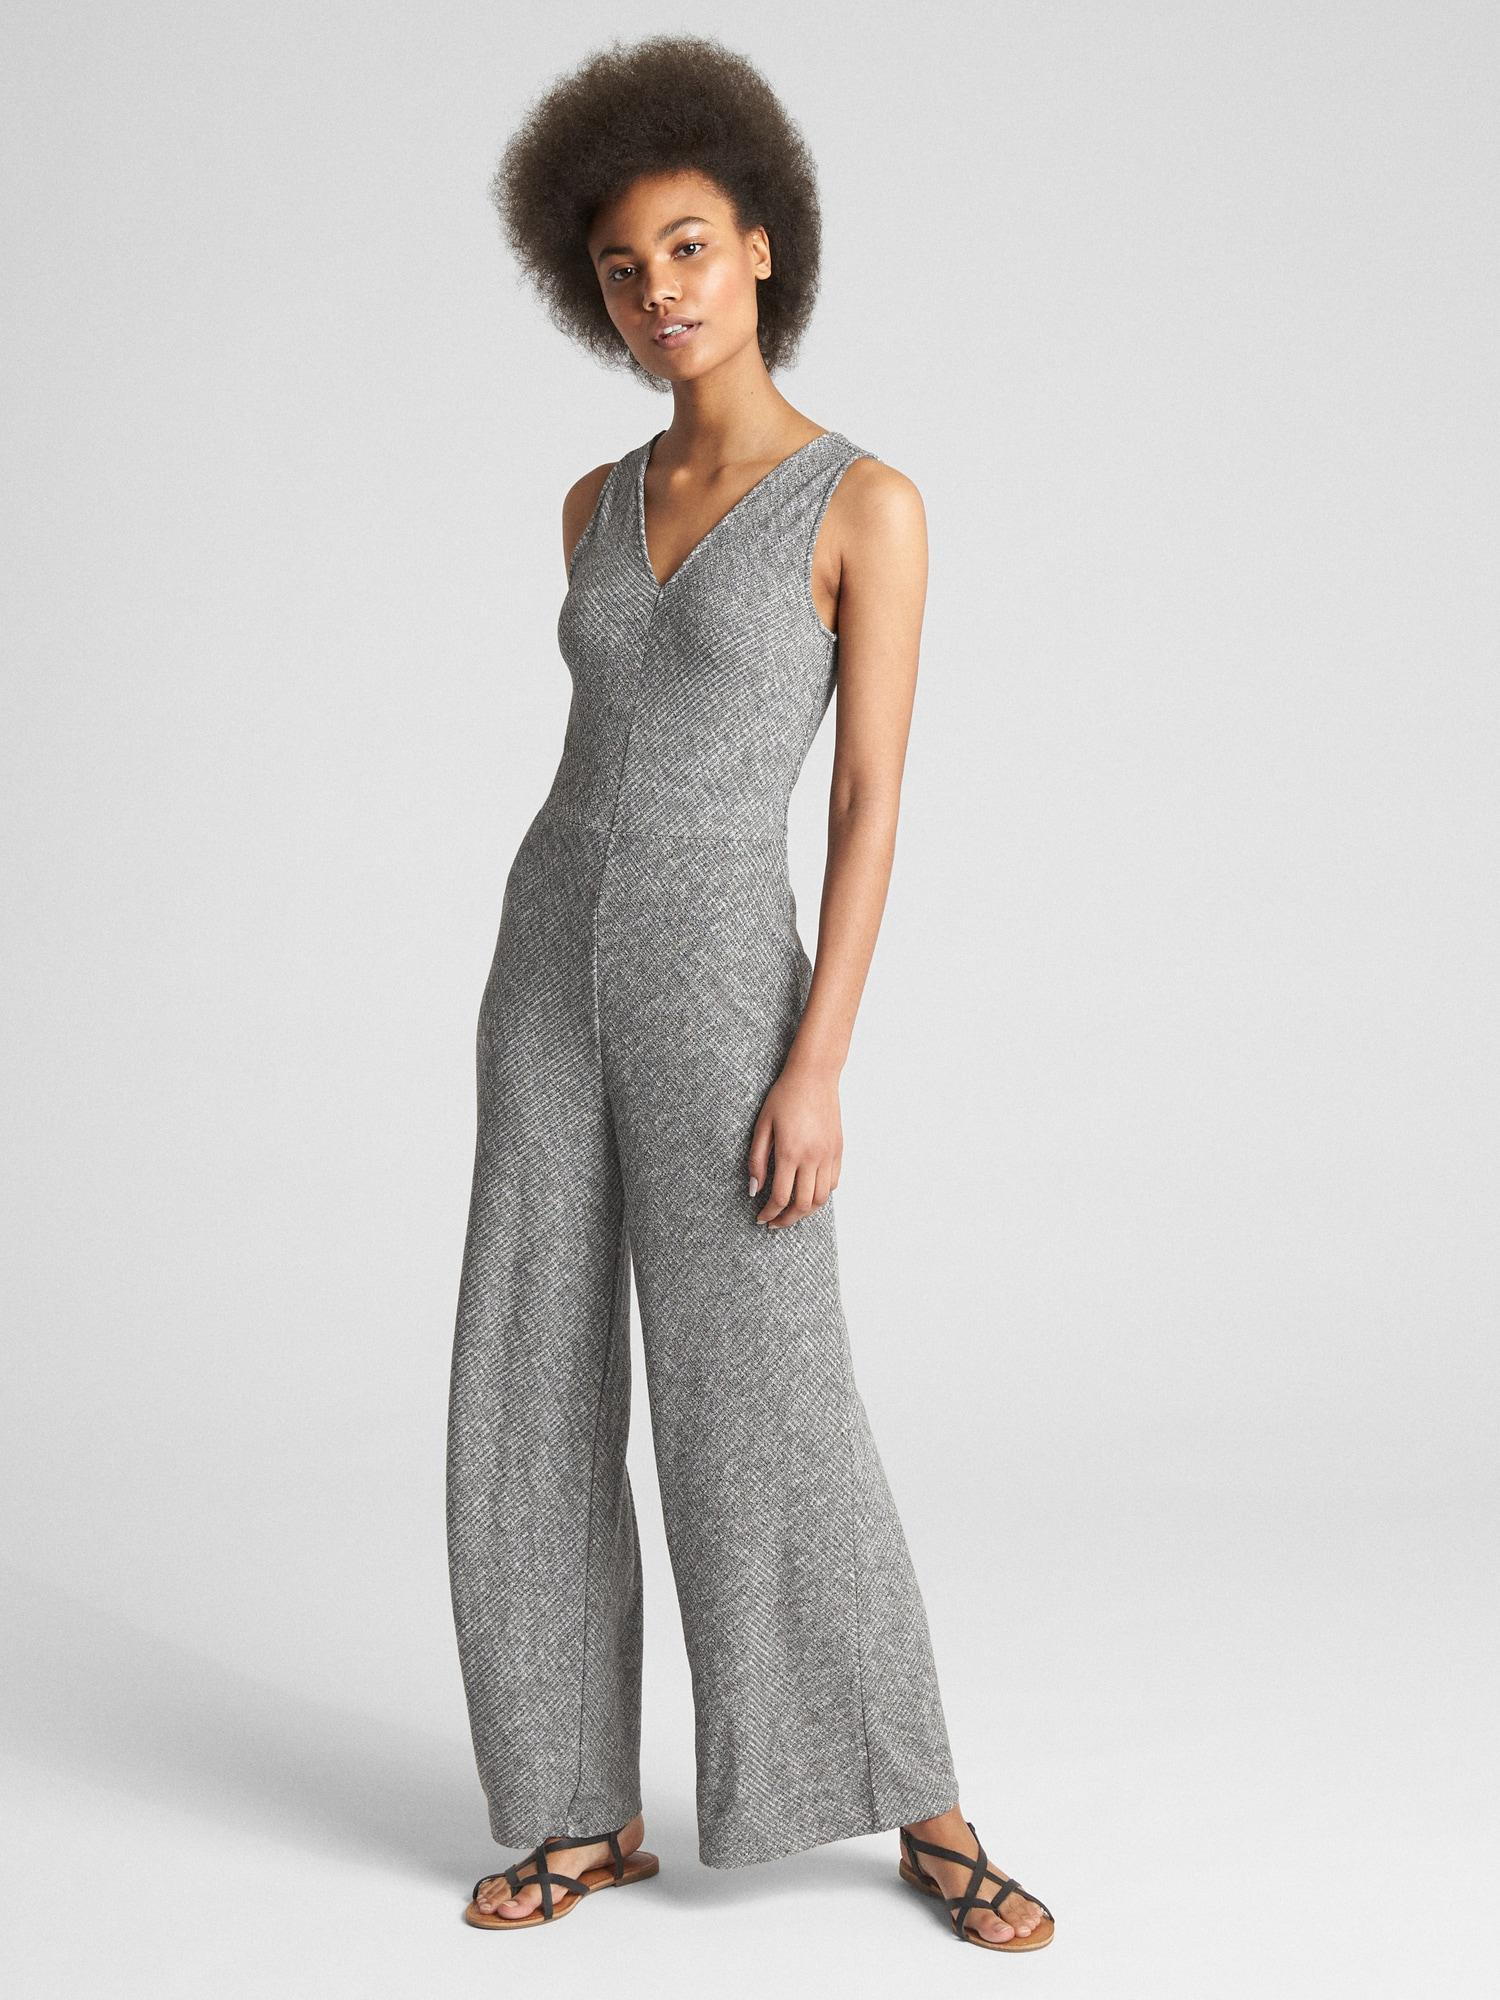 35cdd71750a Lyst - Gap Softspun Sleeveless V-neck Jumpsuit in Gray